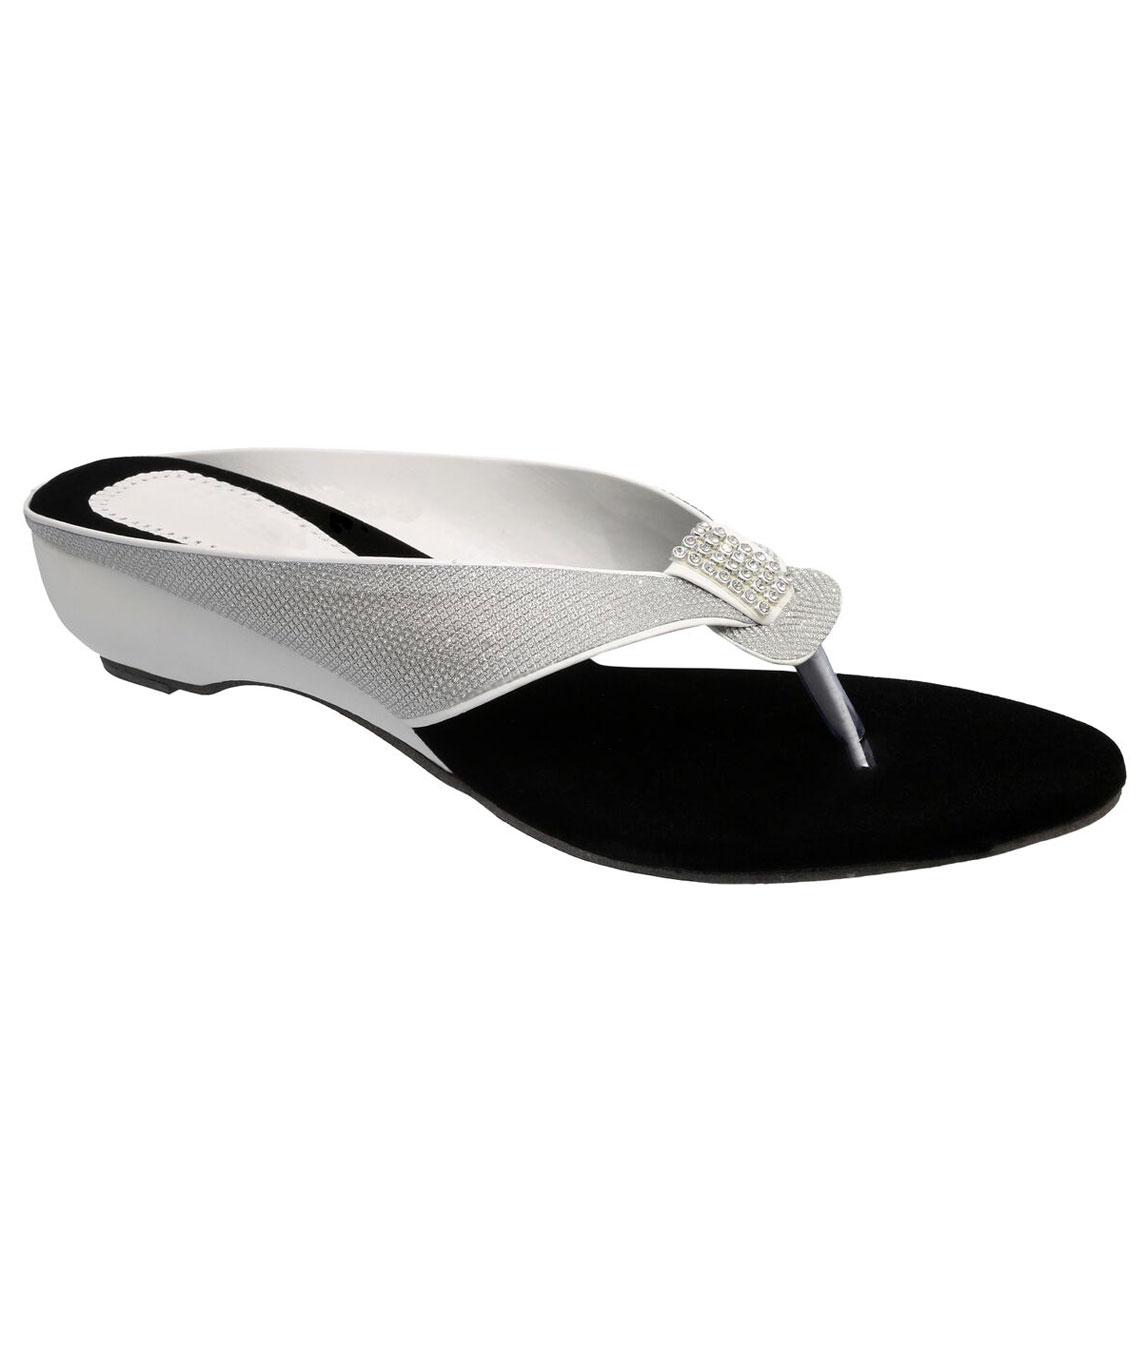 Sindhi Footwear Women`s Silver Rexin Ethnic Sandals